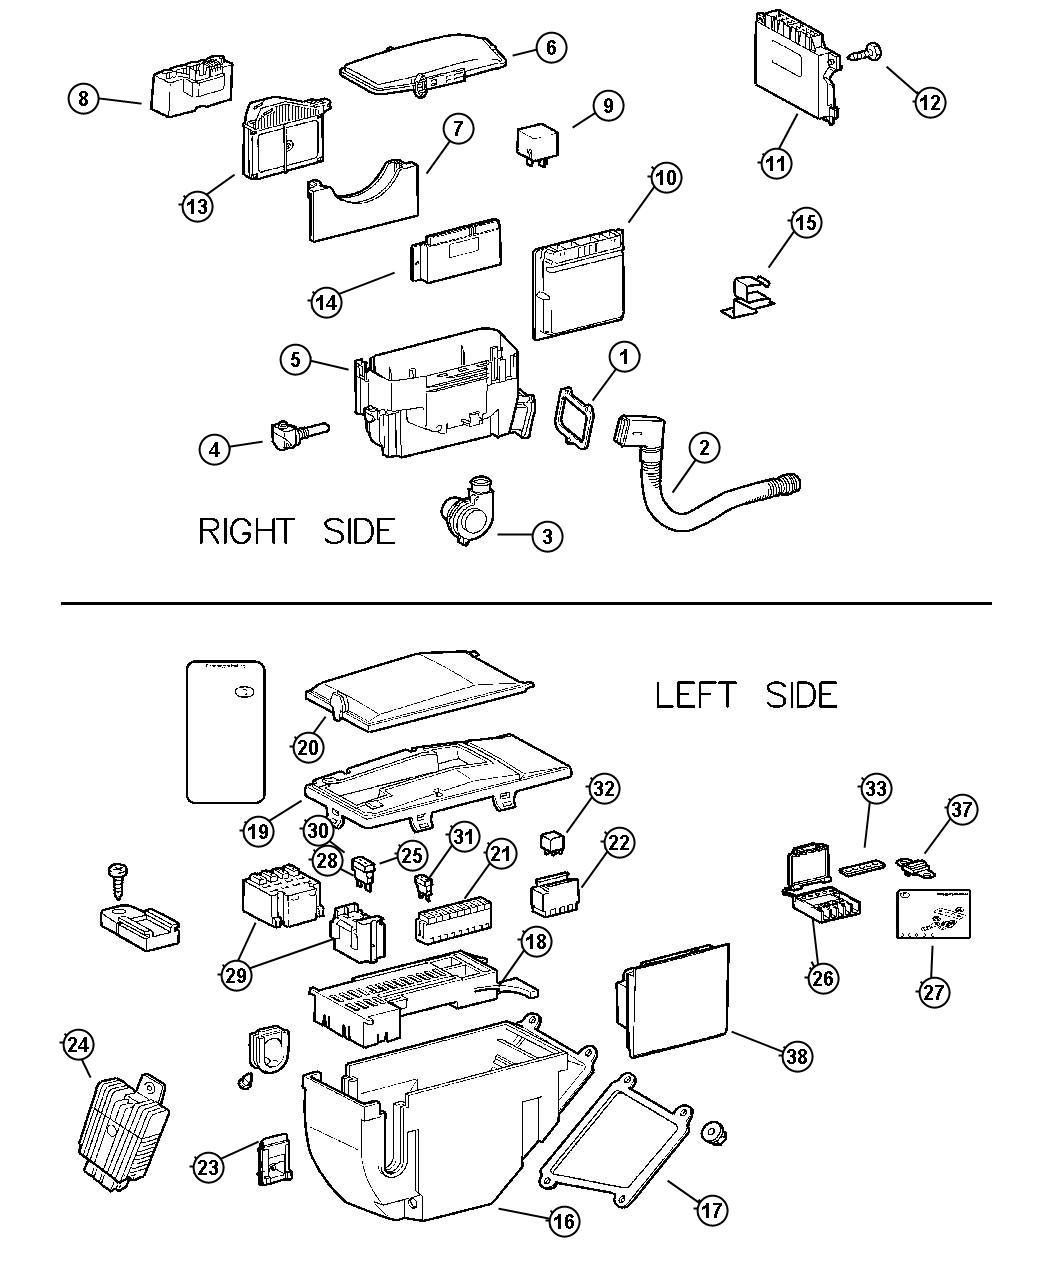 05099007aa mopar relay boxes factory chrysler parts. Black Bedroom Furniture Sets. Home Design Ideas